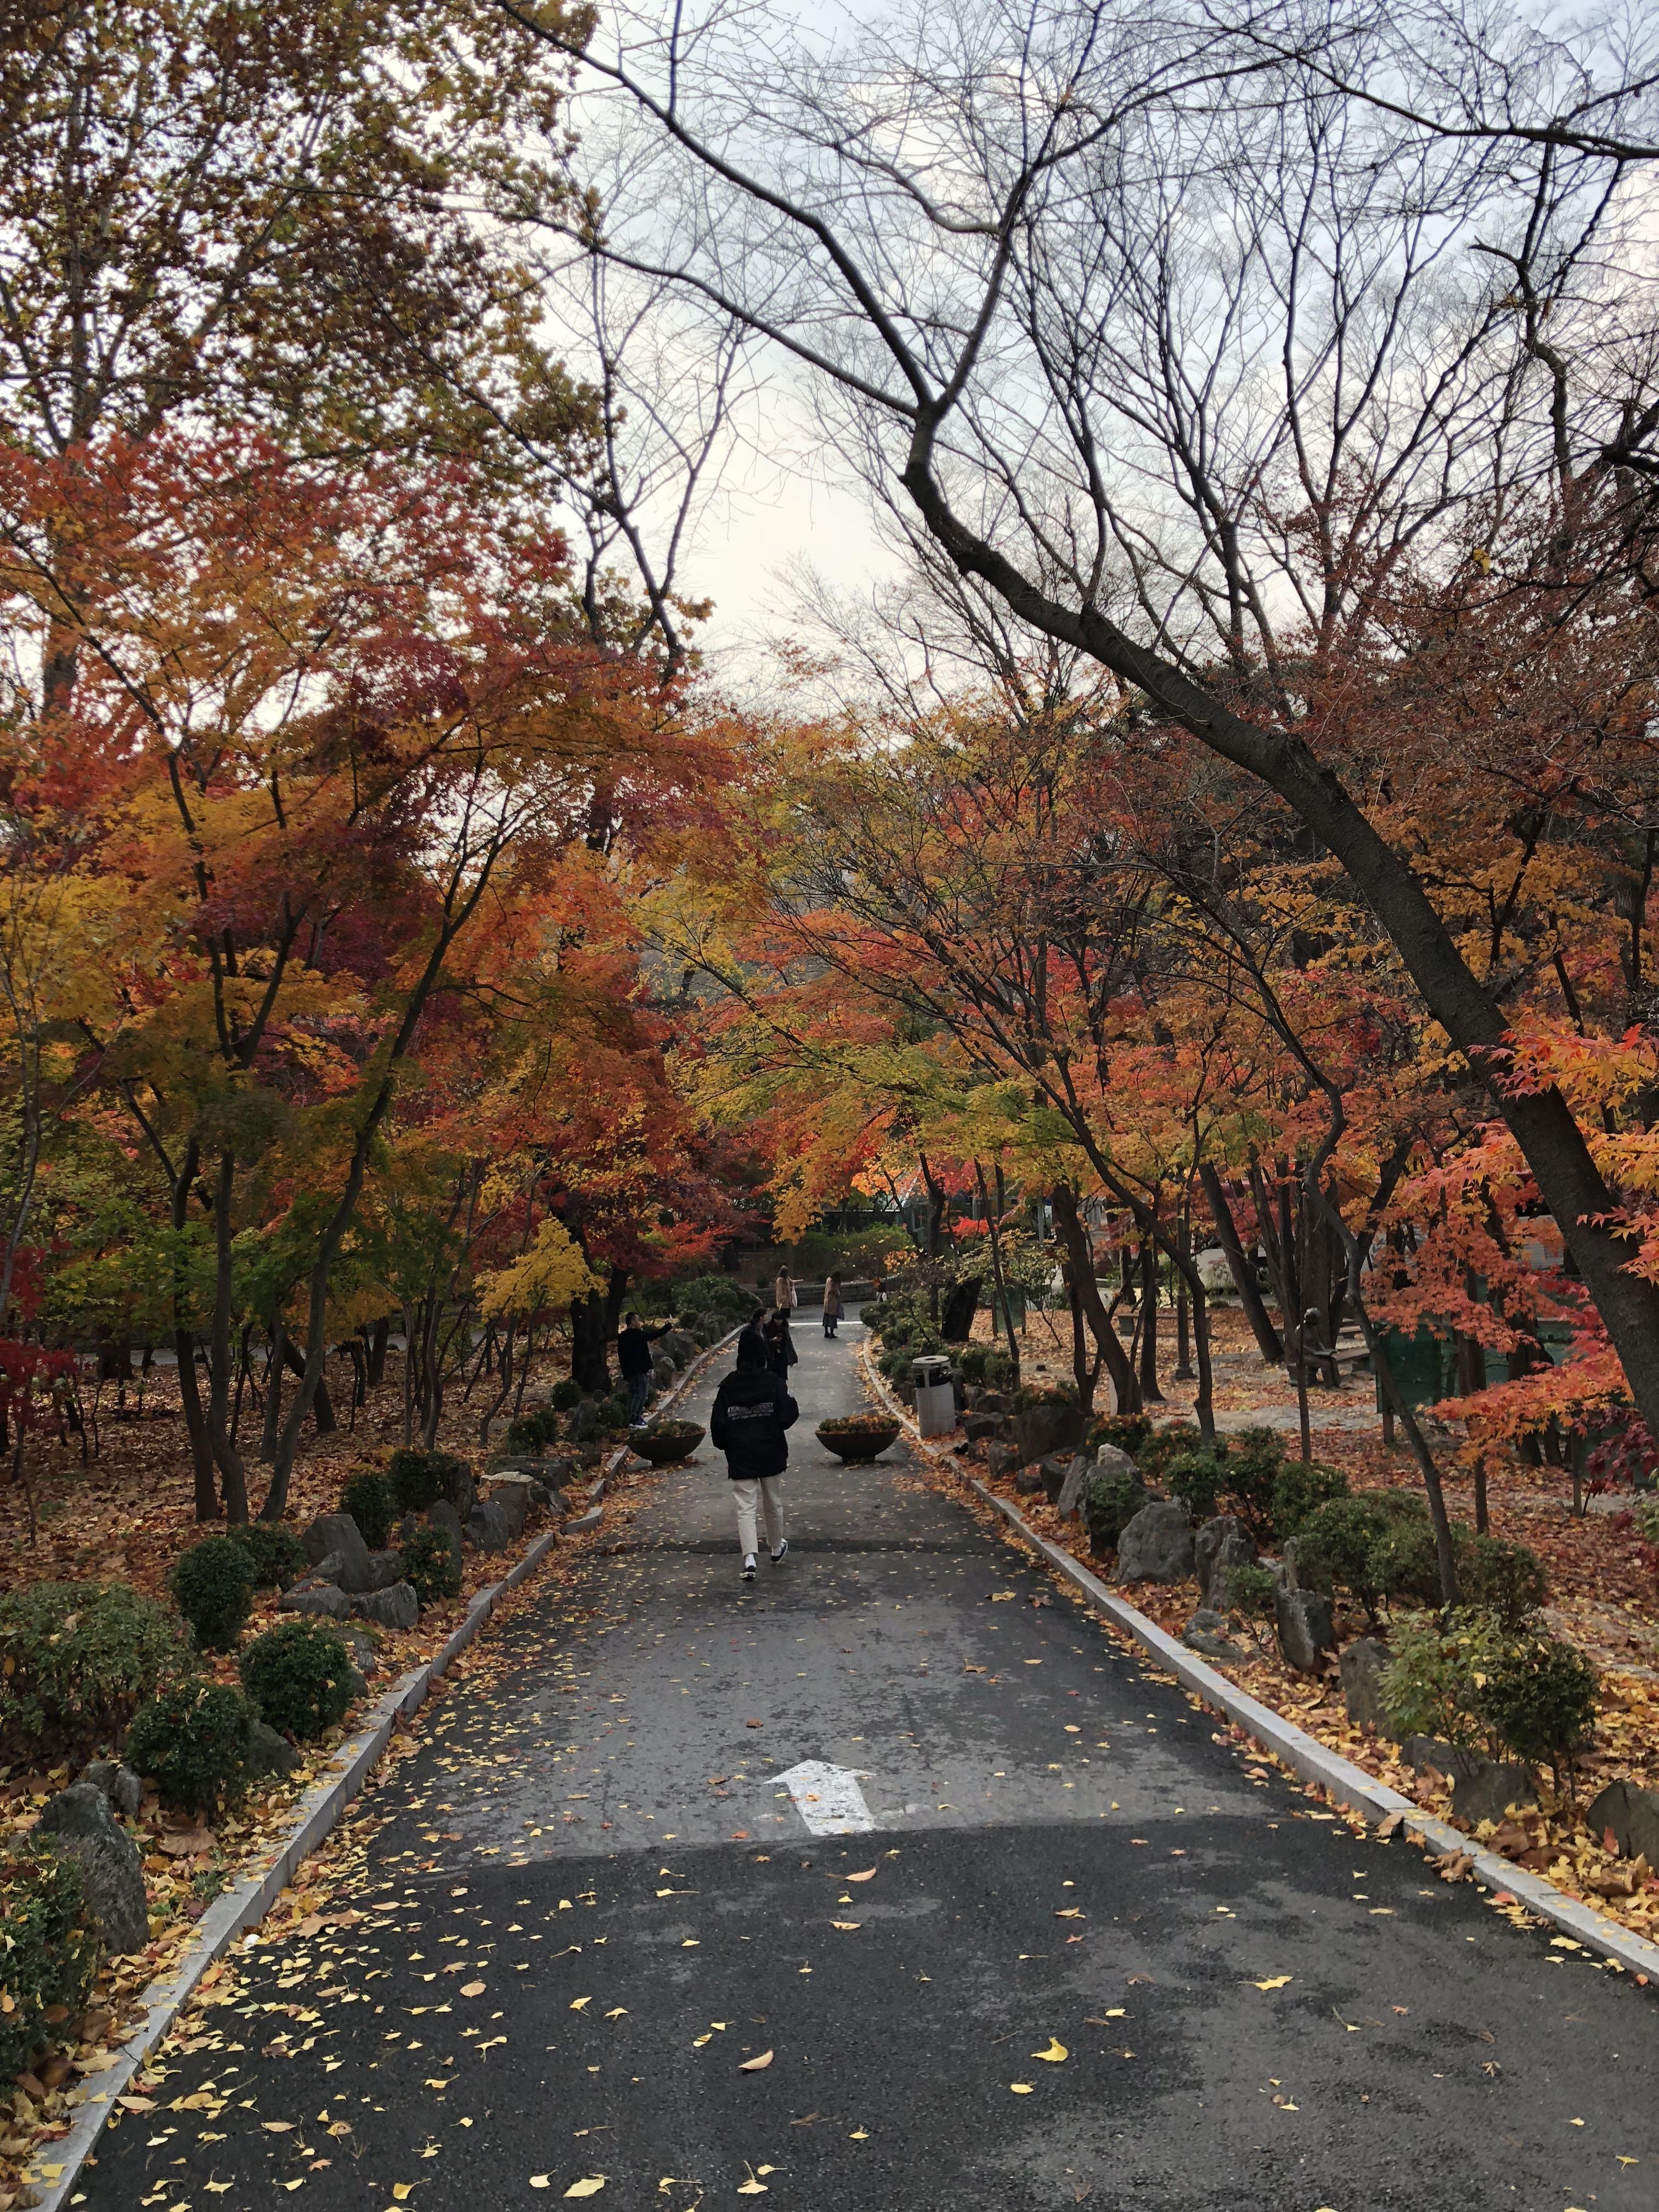 Kyung Hee University - campus photo 10